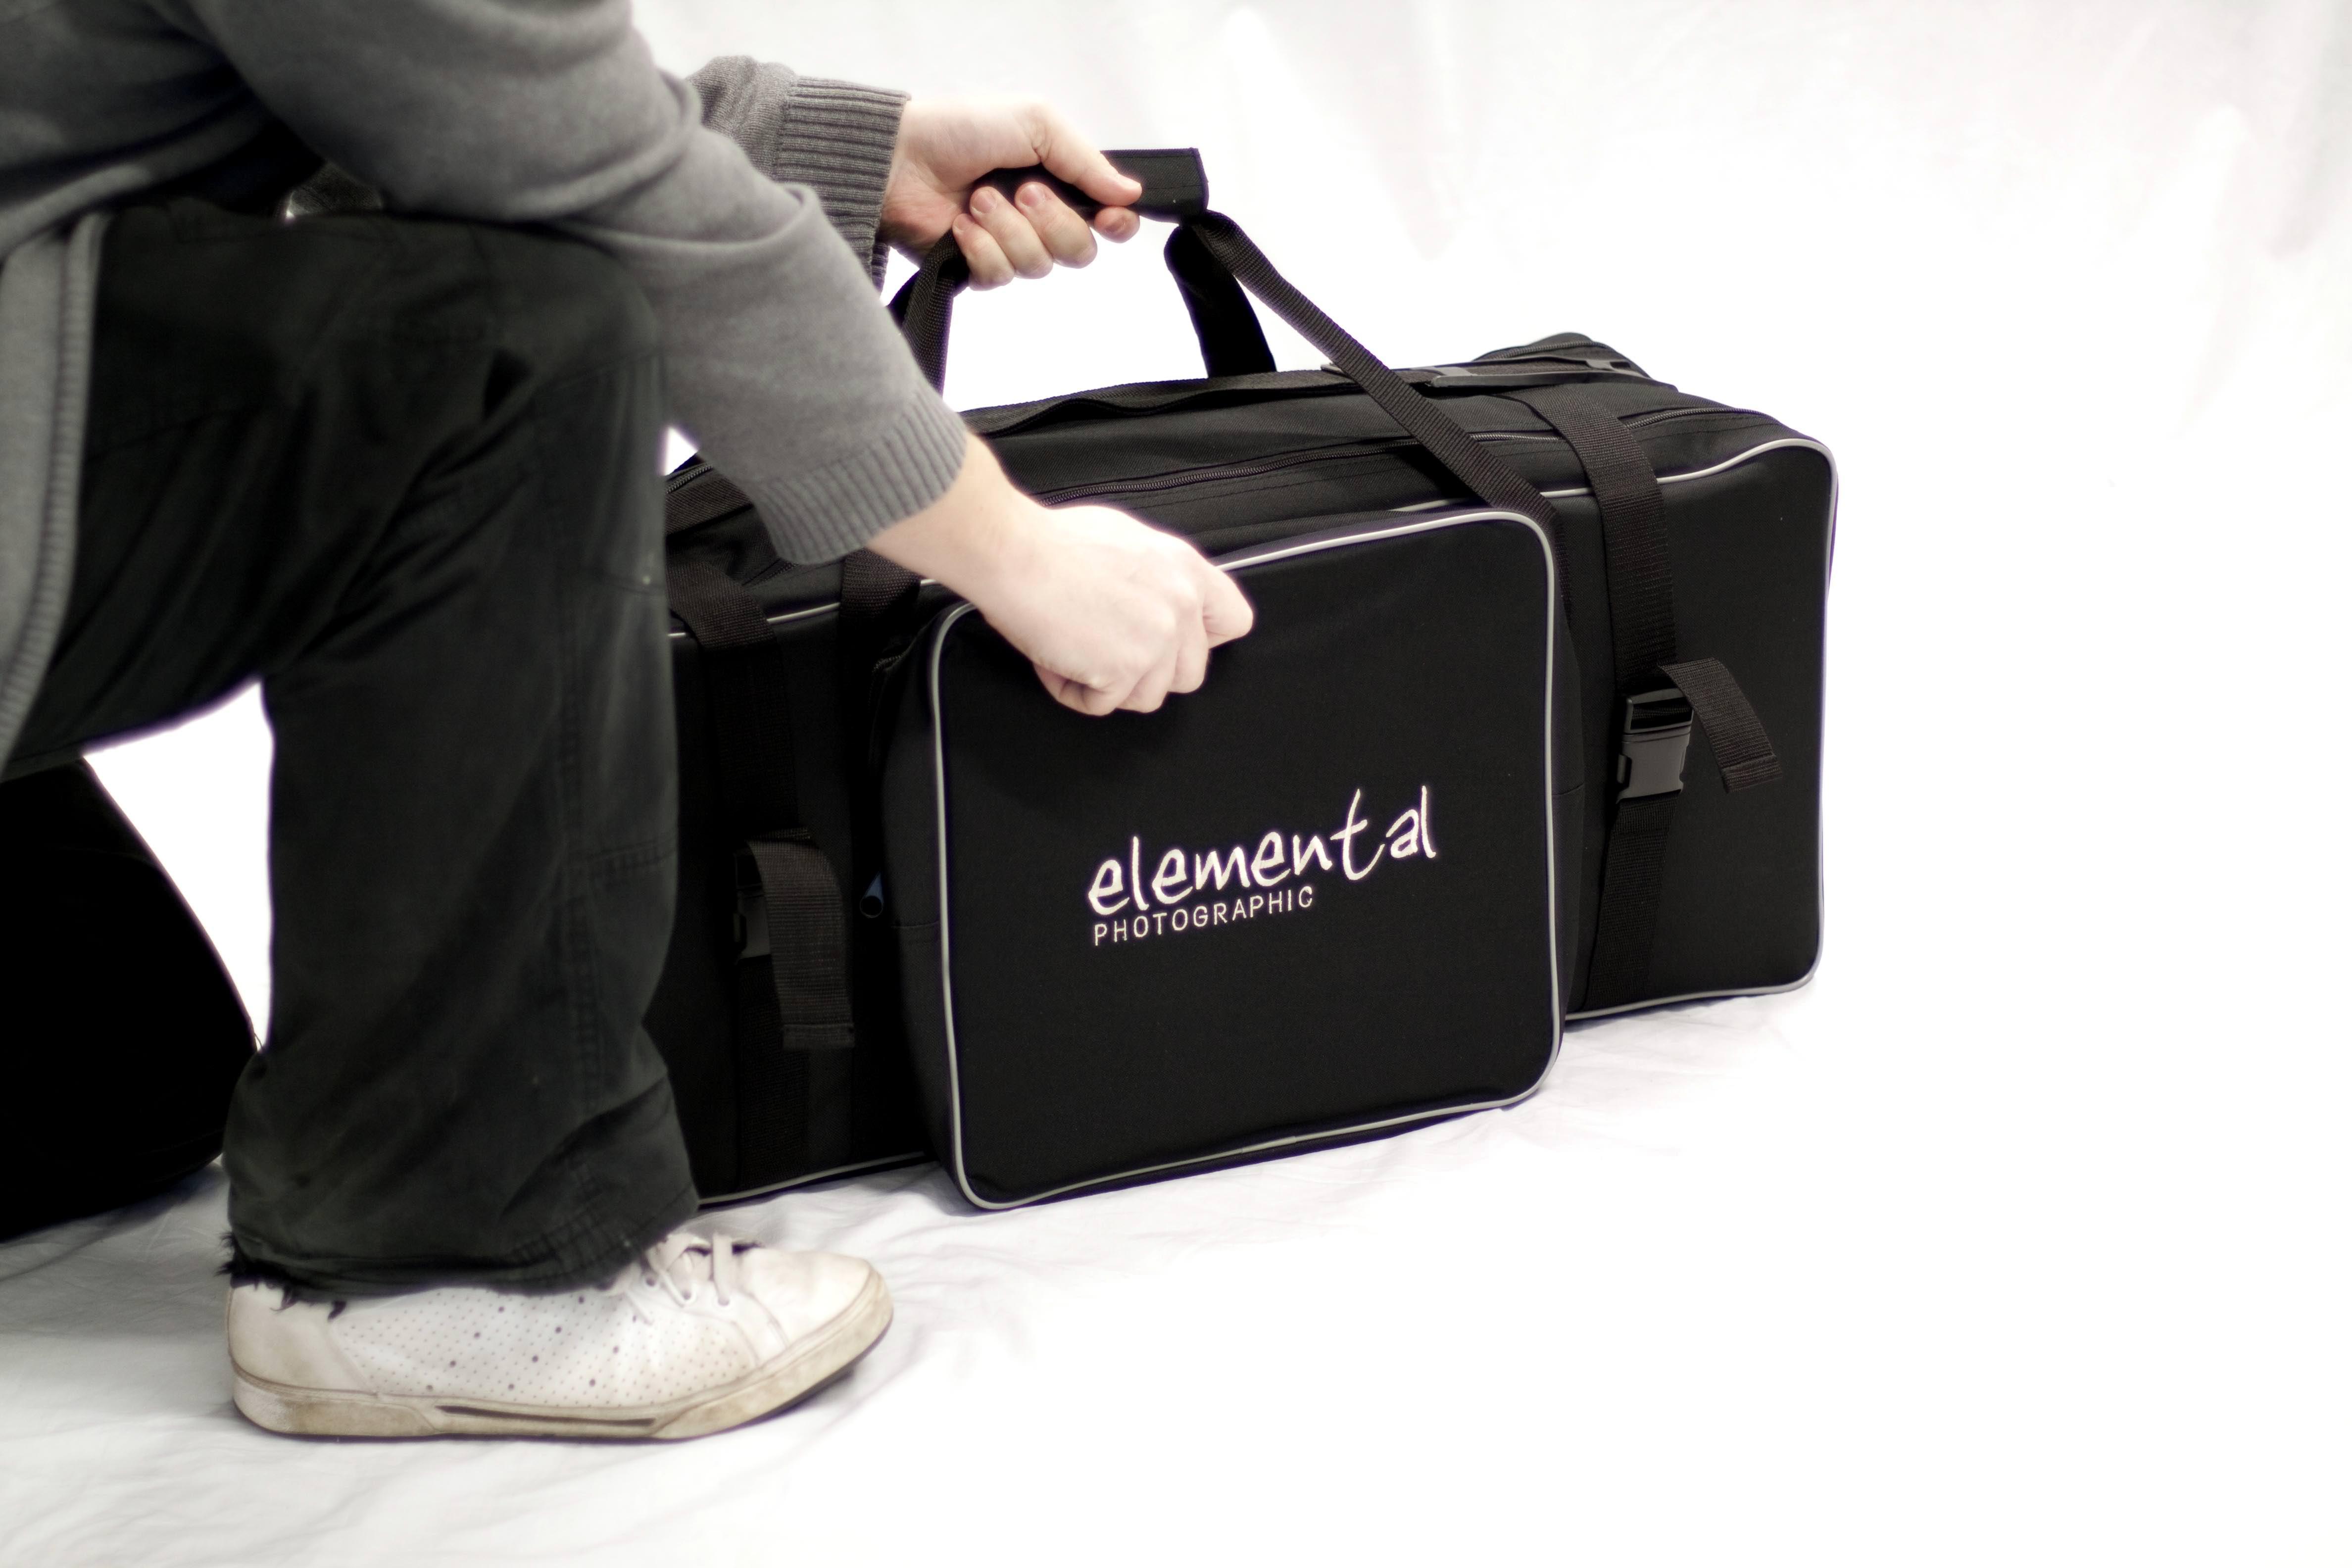 Elemental Genesis 8 kit bag  sc 1 st  ePHOTOzine & Elemental Genesis 8 Studio Lighting and Flash Review azcodes.com